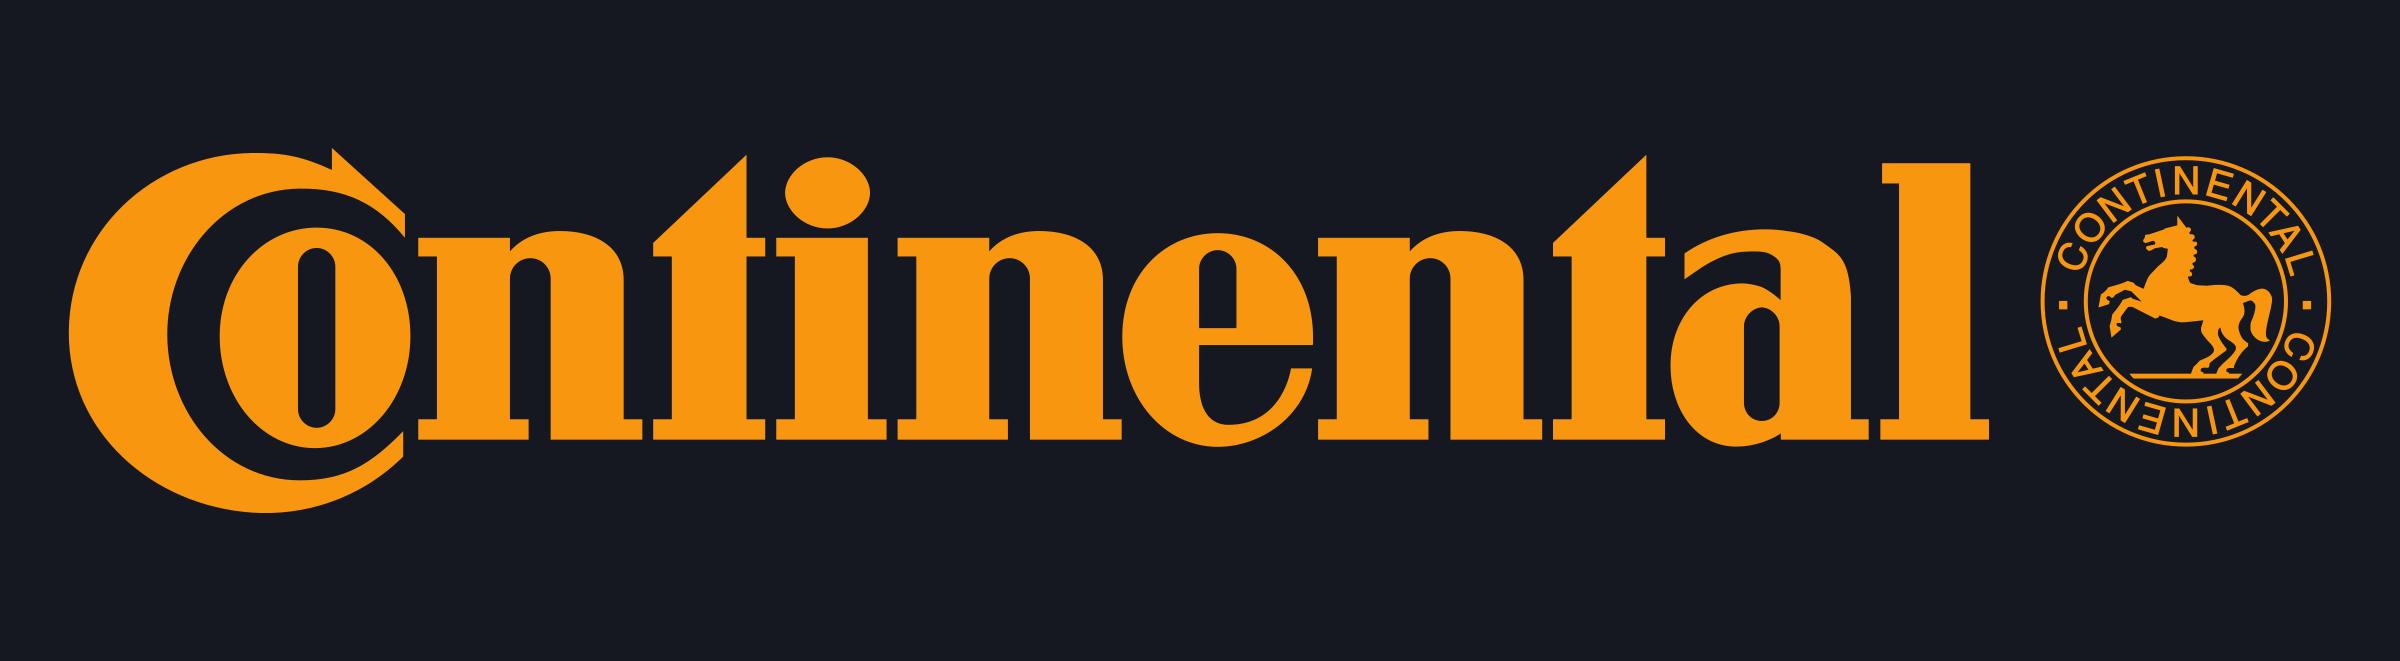 Continental Logo PNG Transparent & SVG Vector.